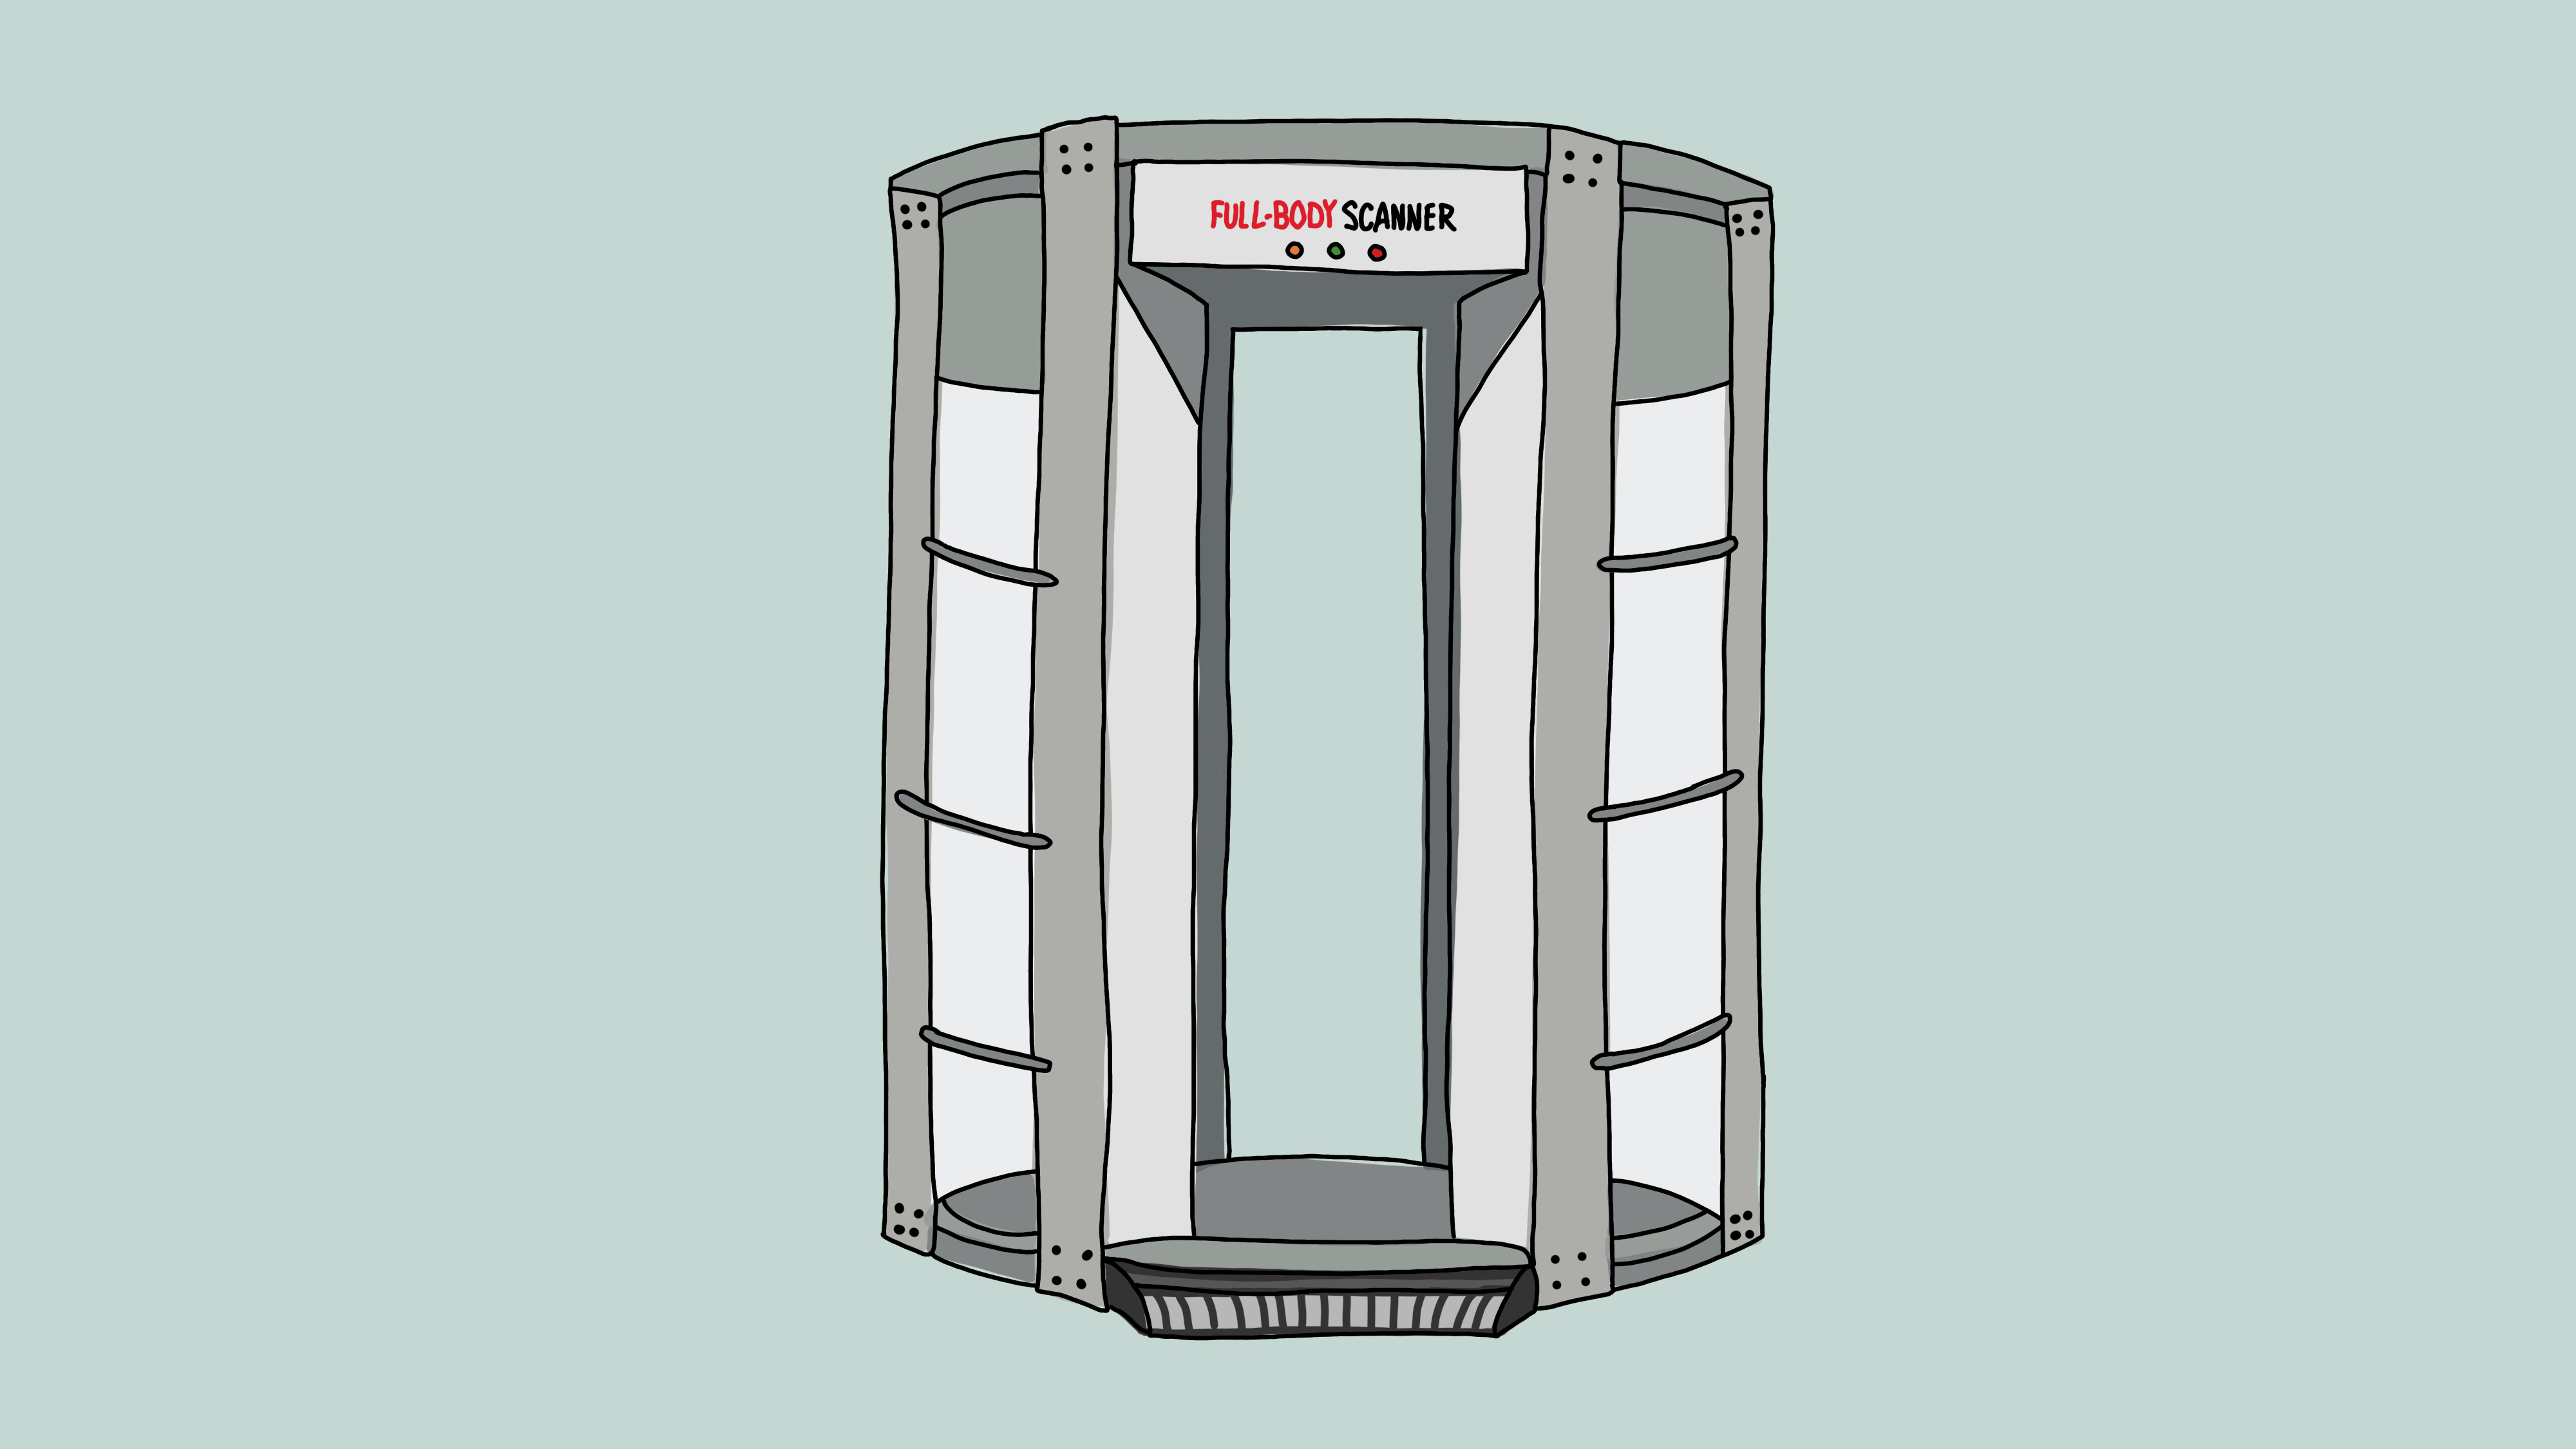 An illustration of a TSA body scanner.